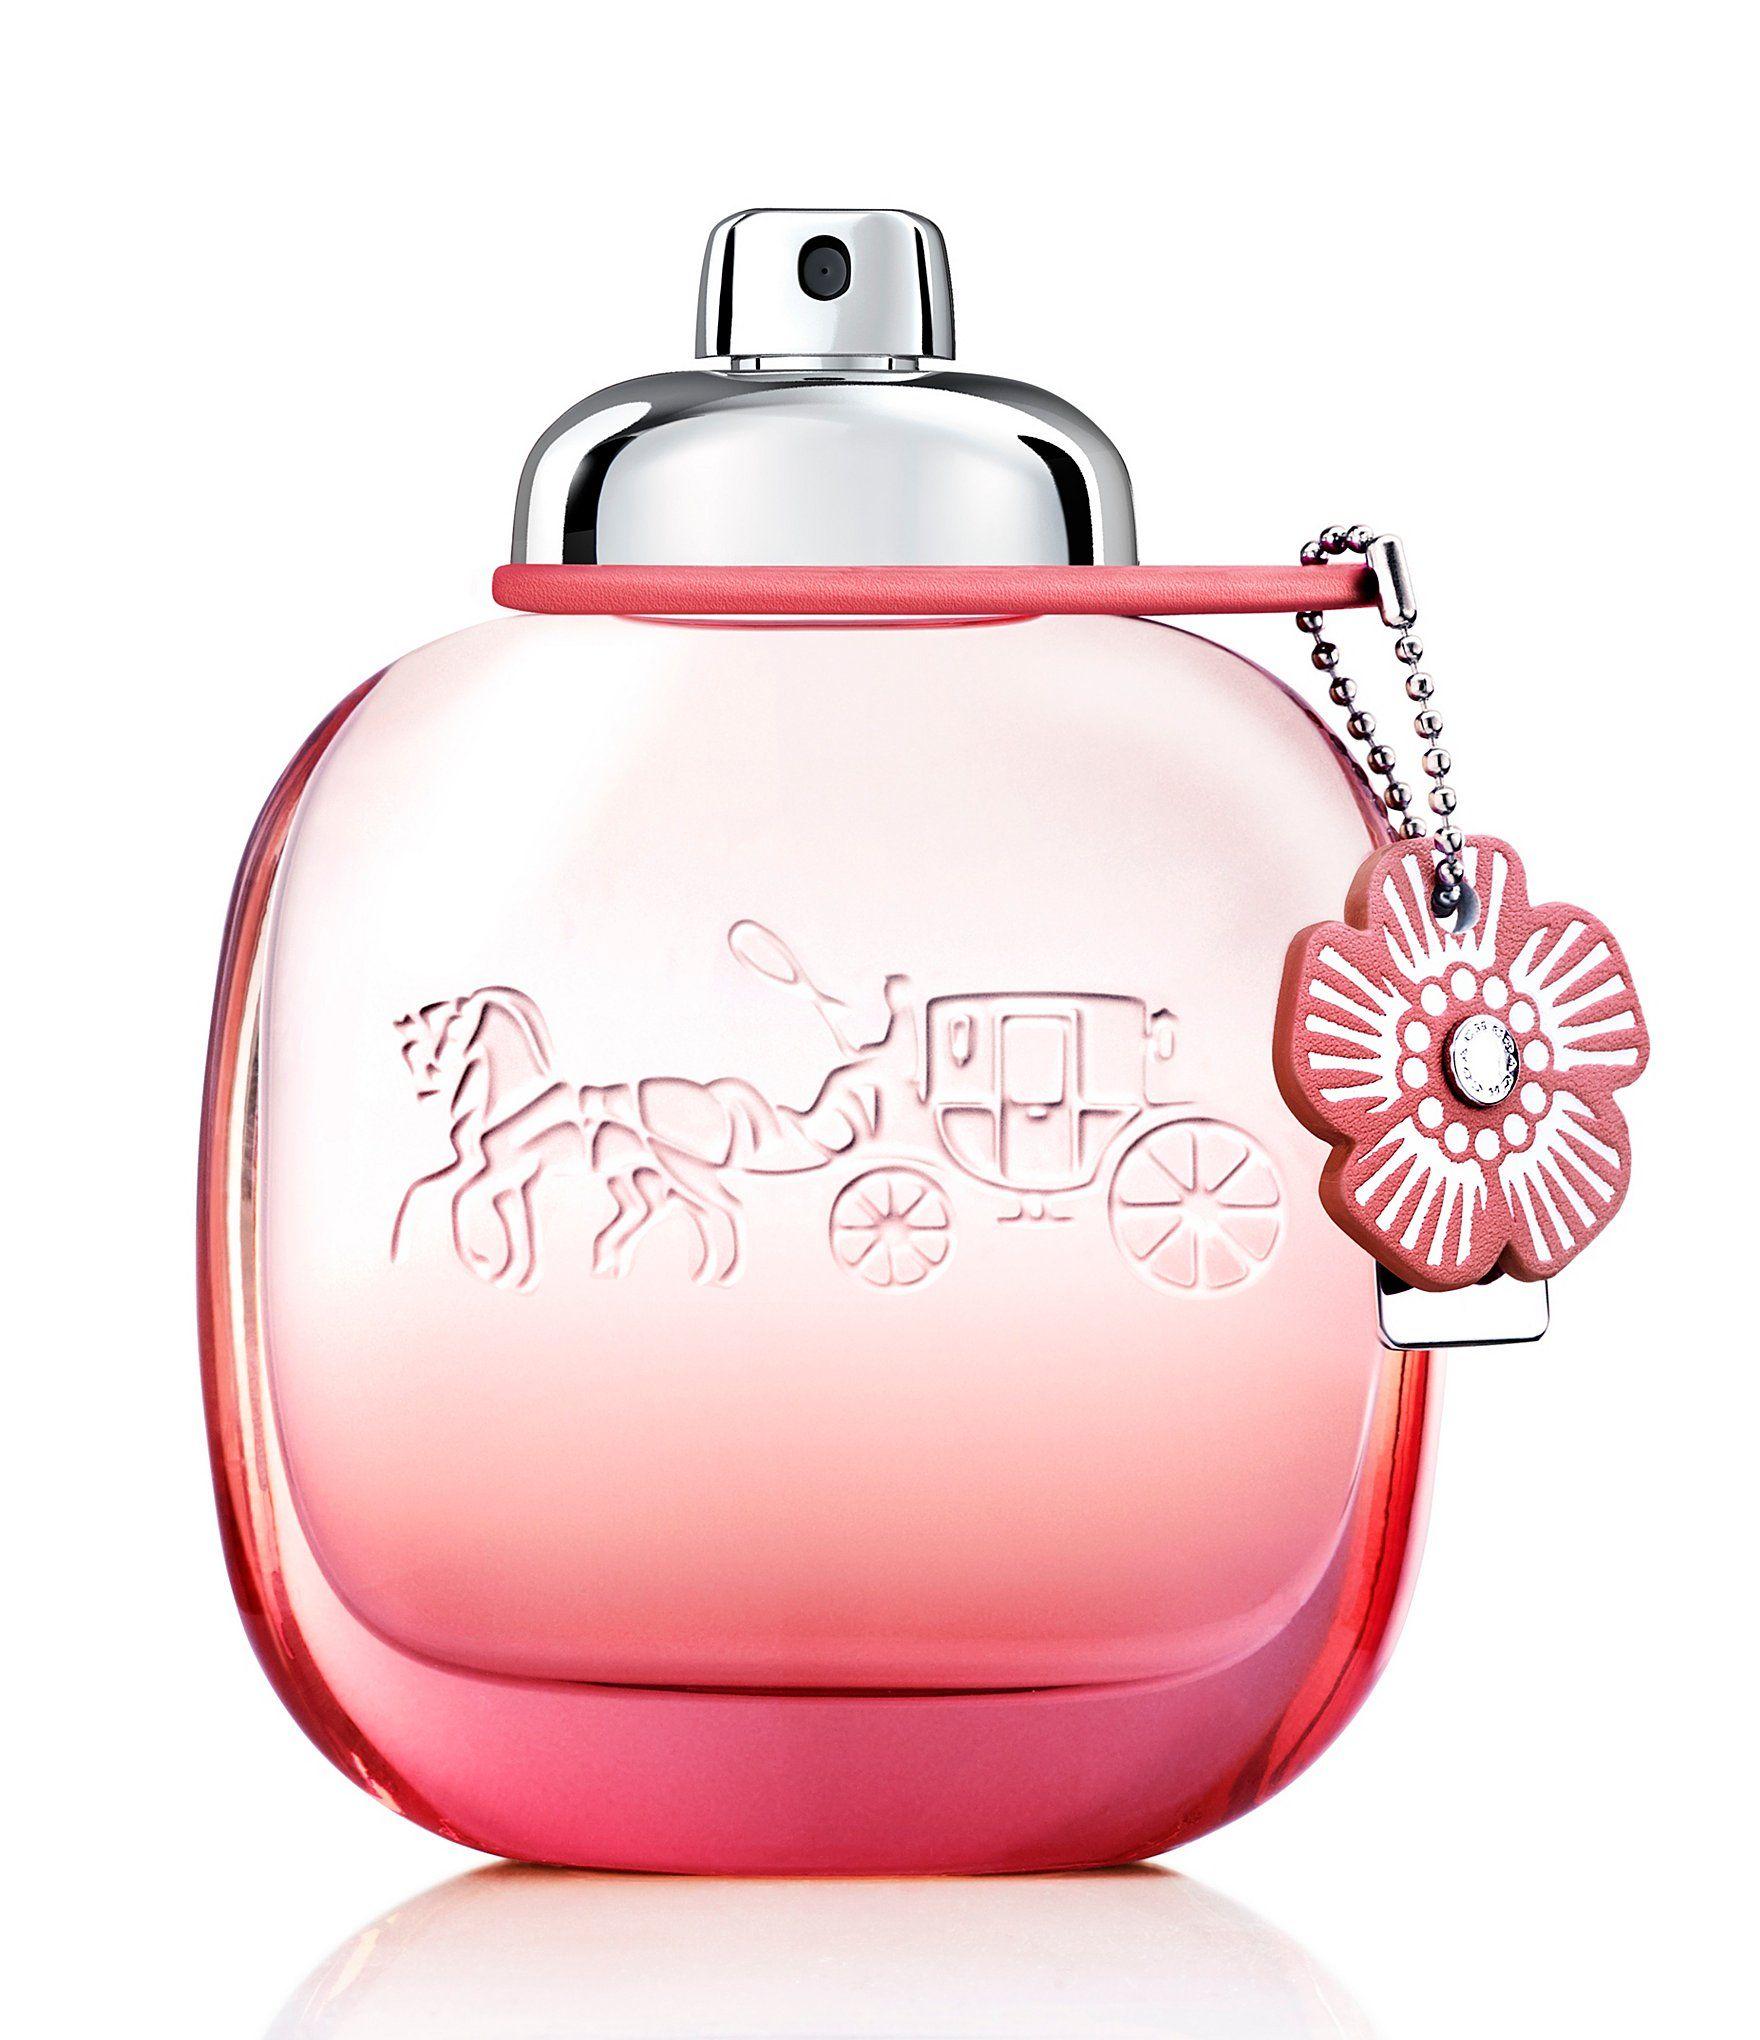 Coach Dreams Eau De Parfum Gift Set Dillard S In 2020 Perfume Eau De Parfum Coach Perfume